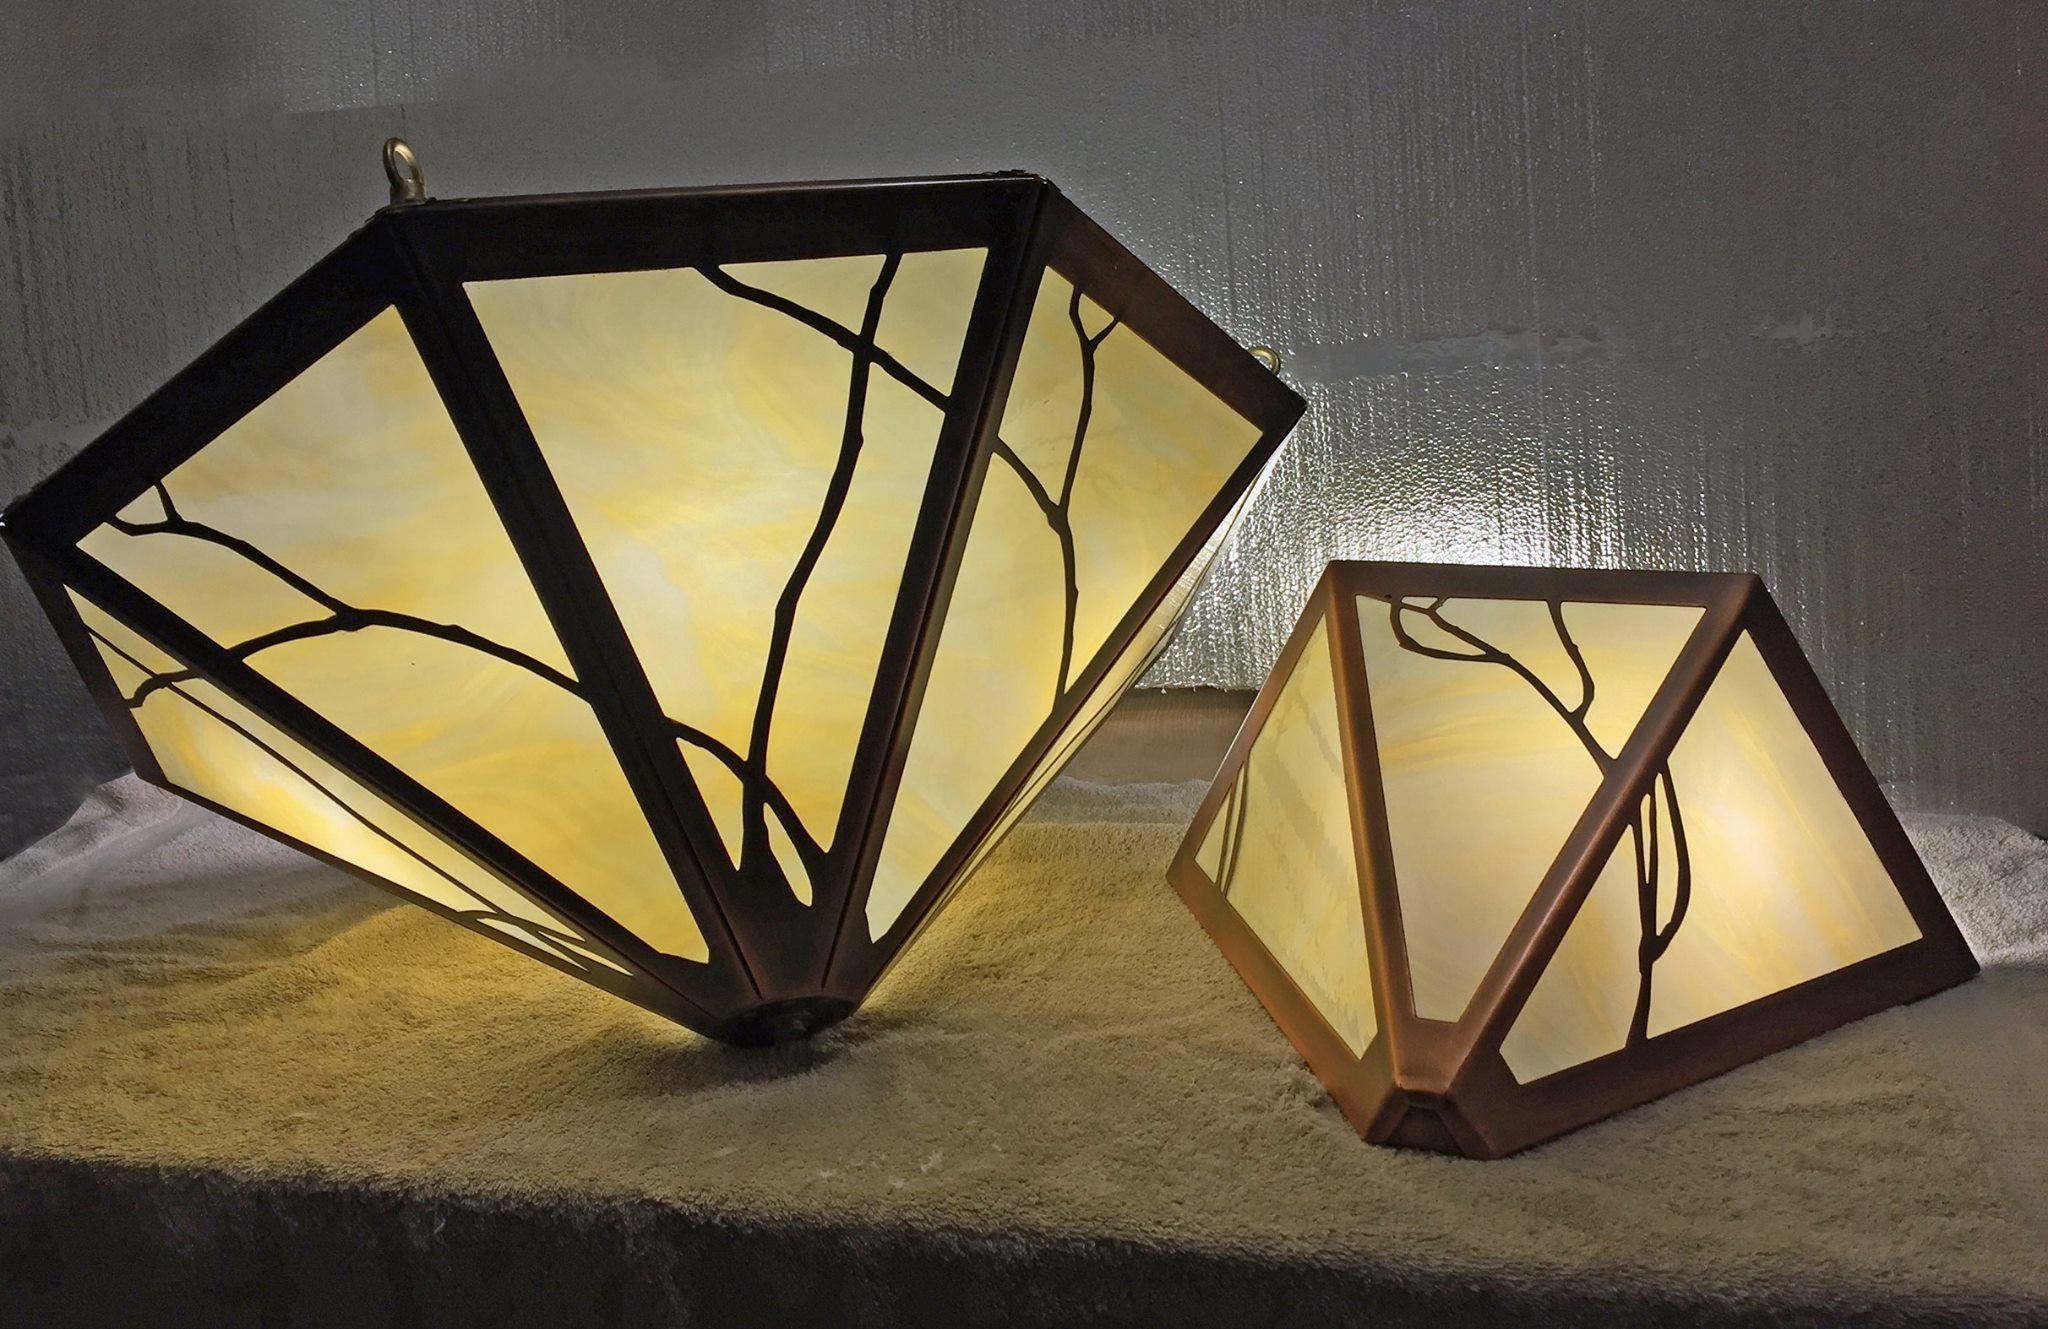 Workbench photo - James Mattson Coppercraft art nouveau chandelier ...